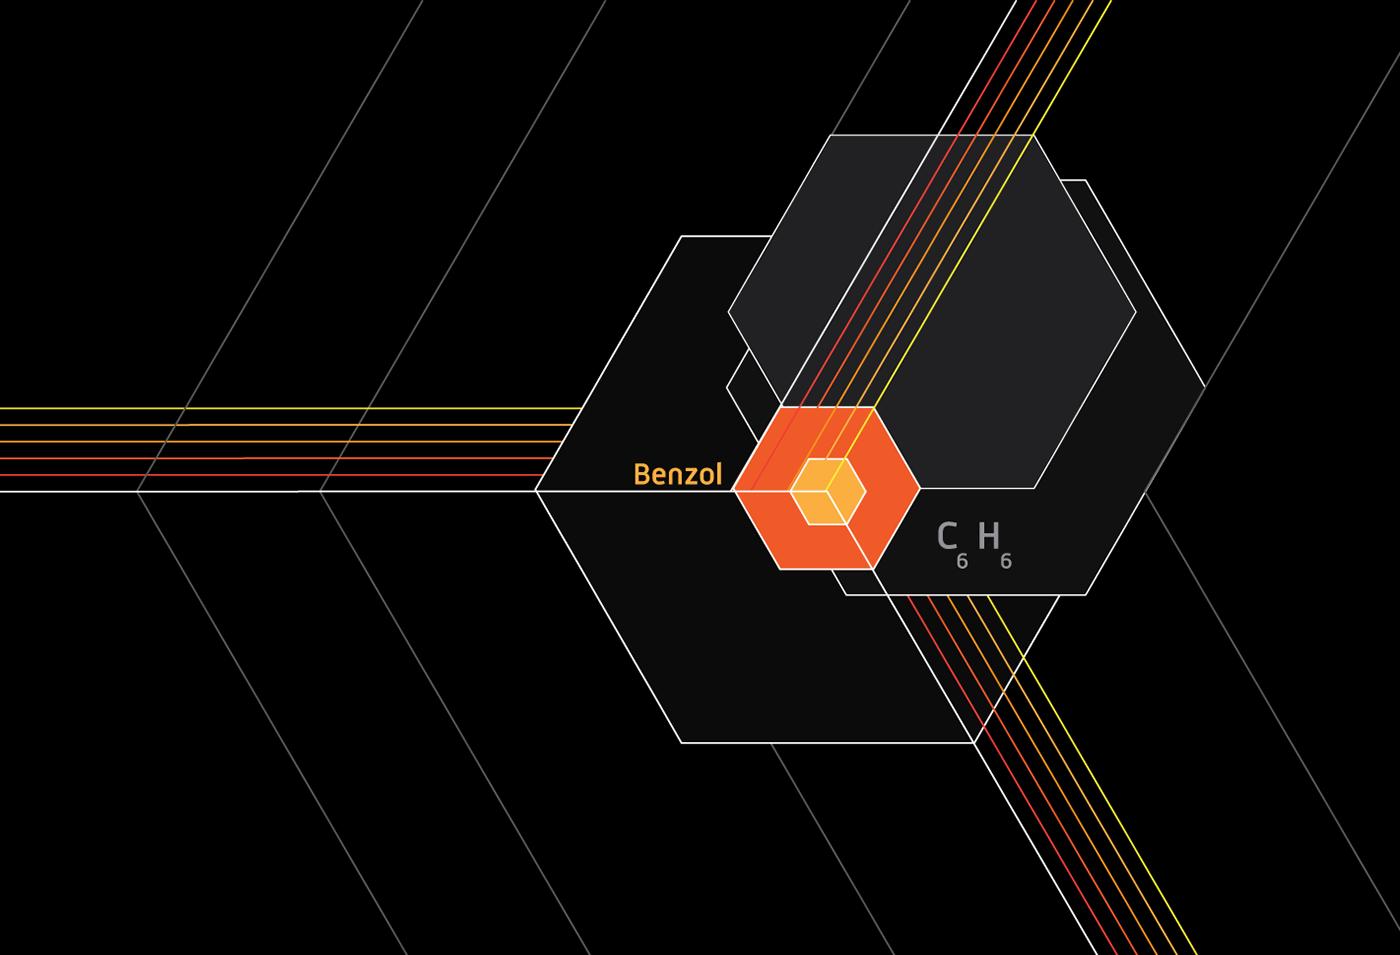 benzol martin mele diseño gráfico brand